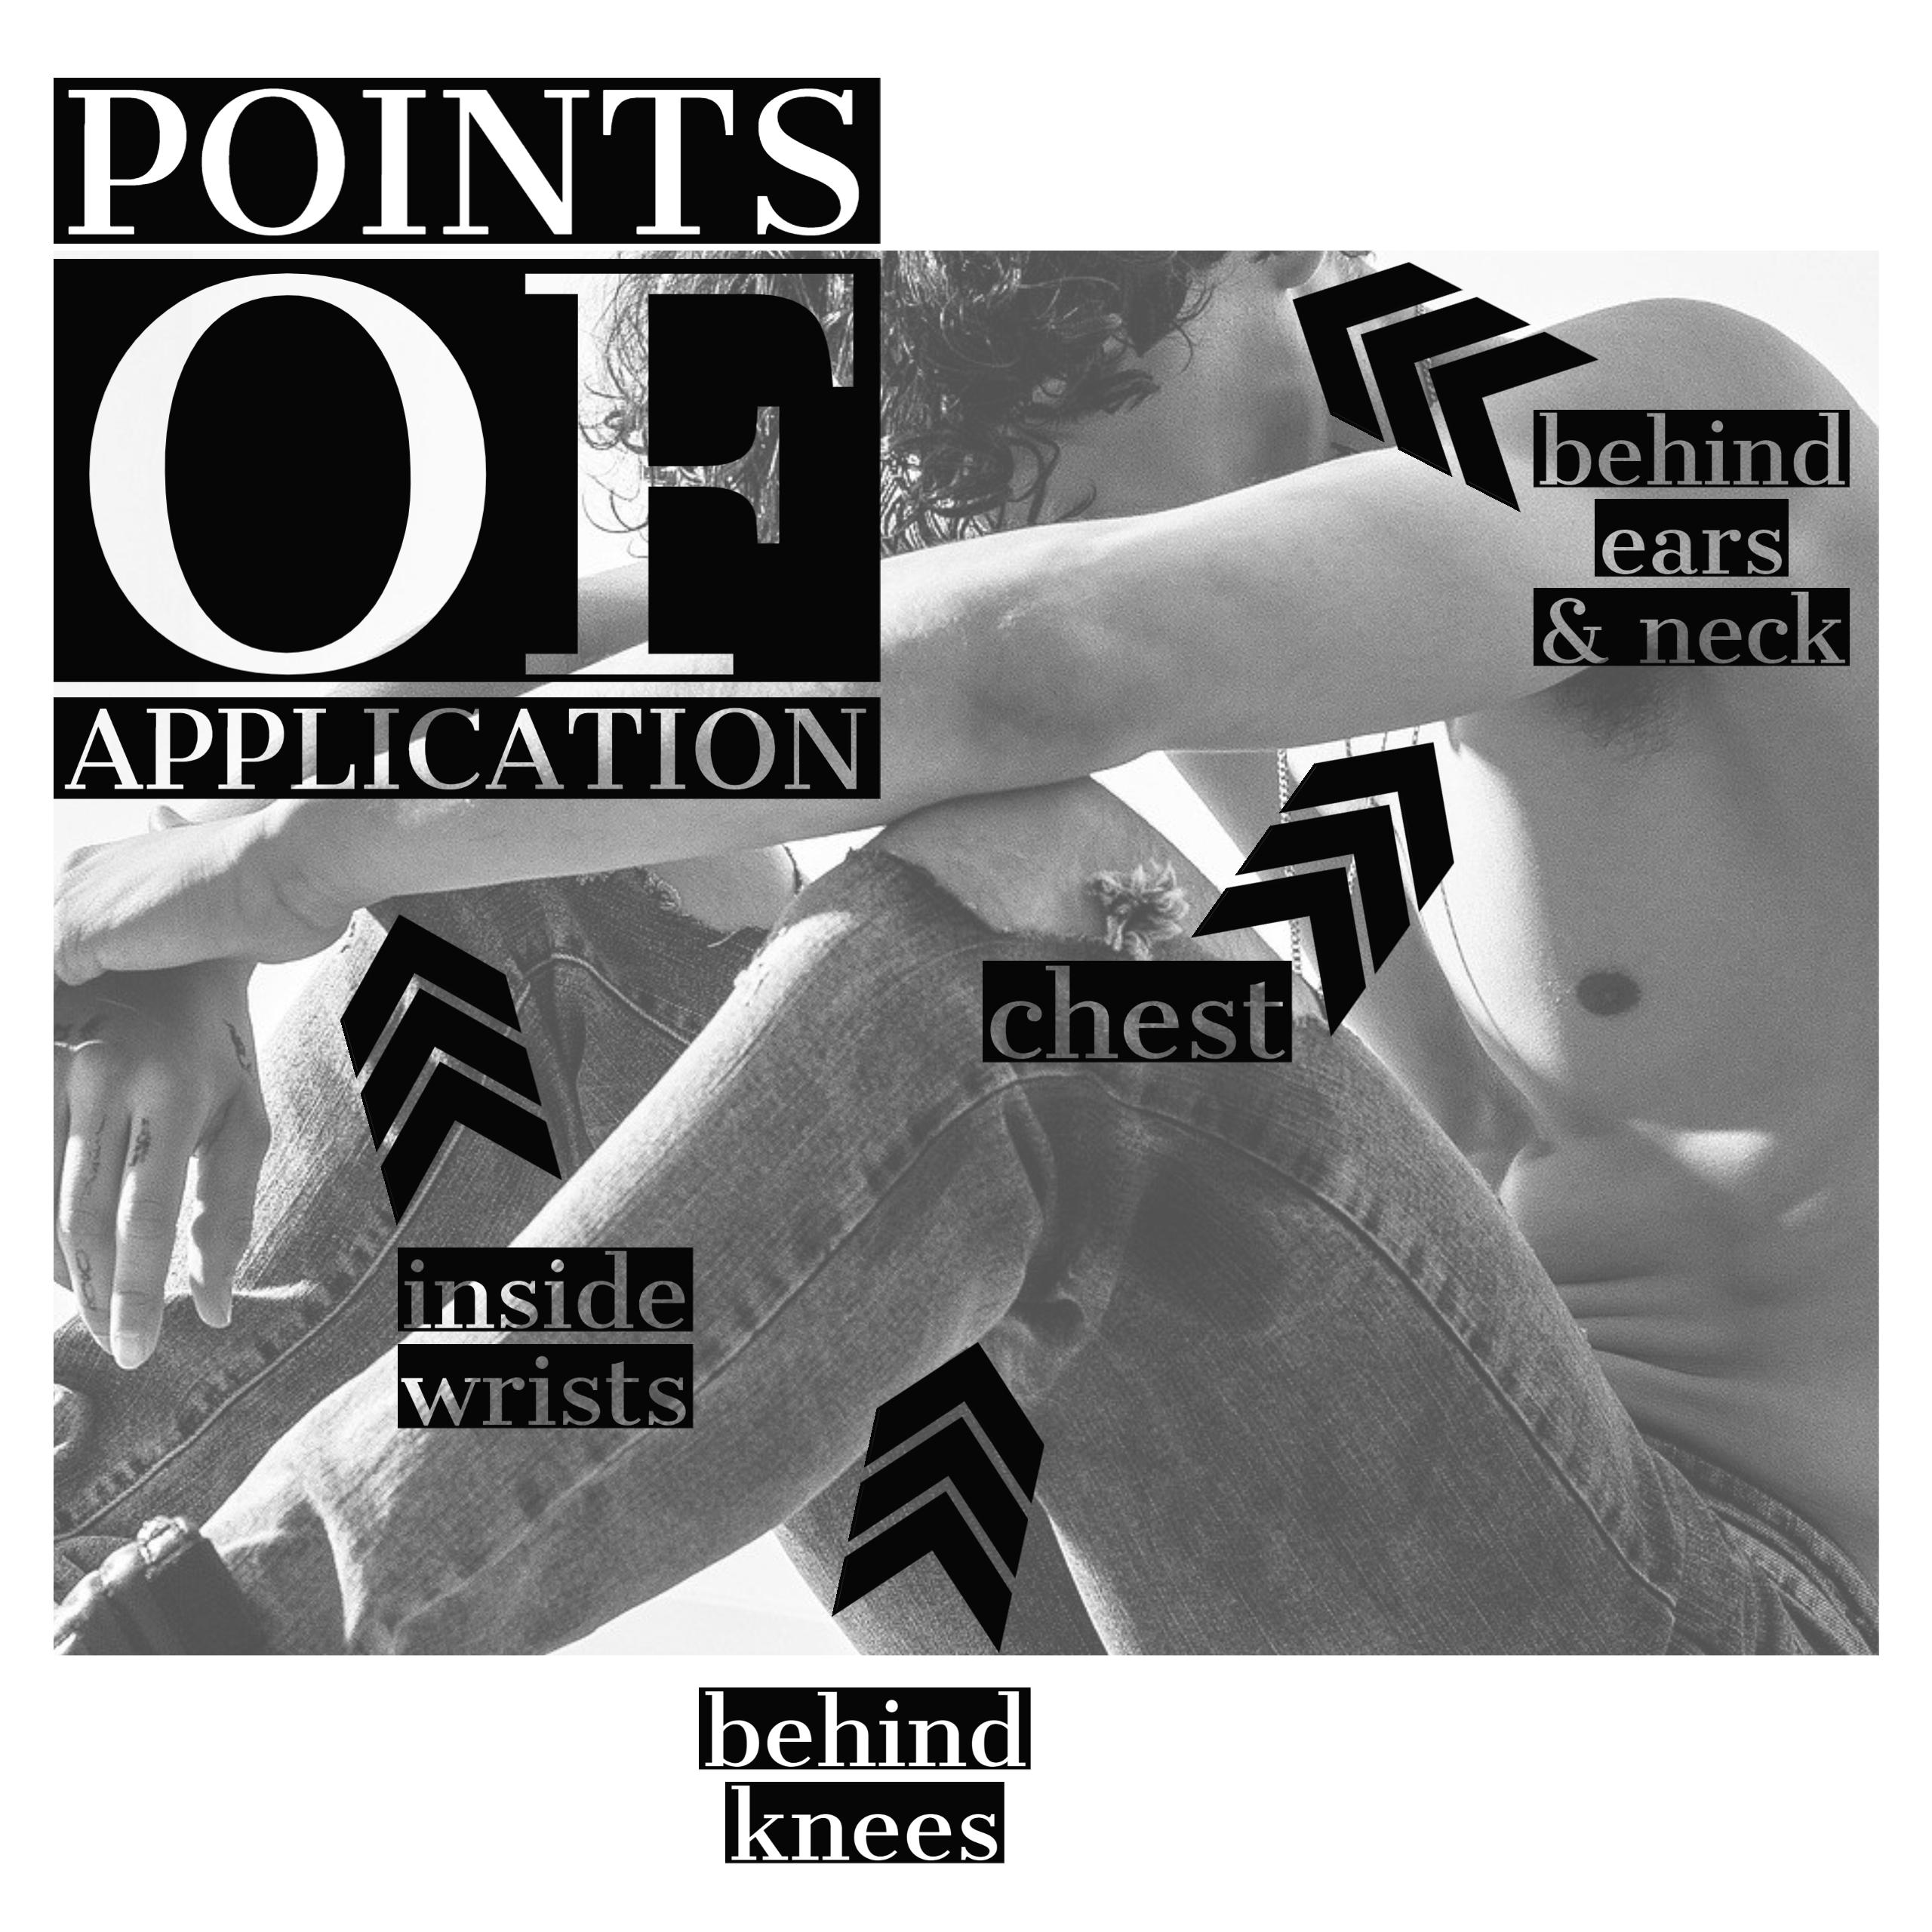 pulse-points-image.jpg